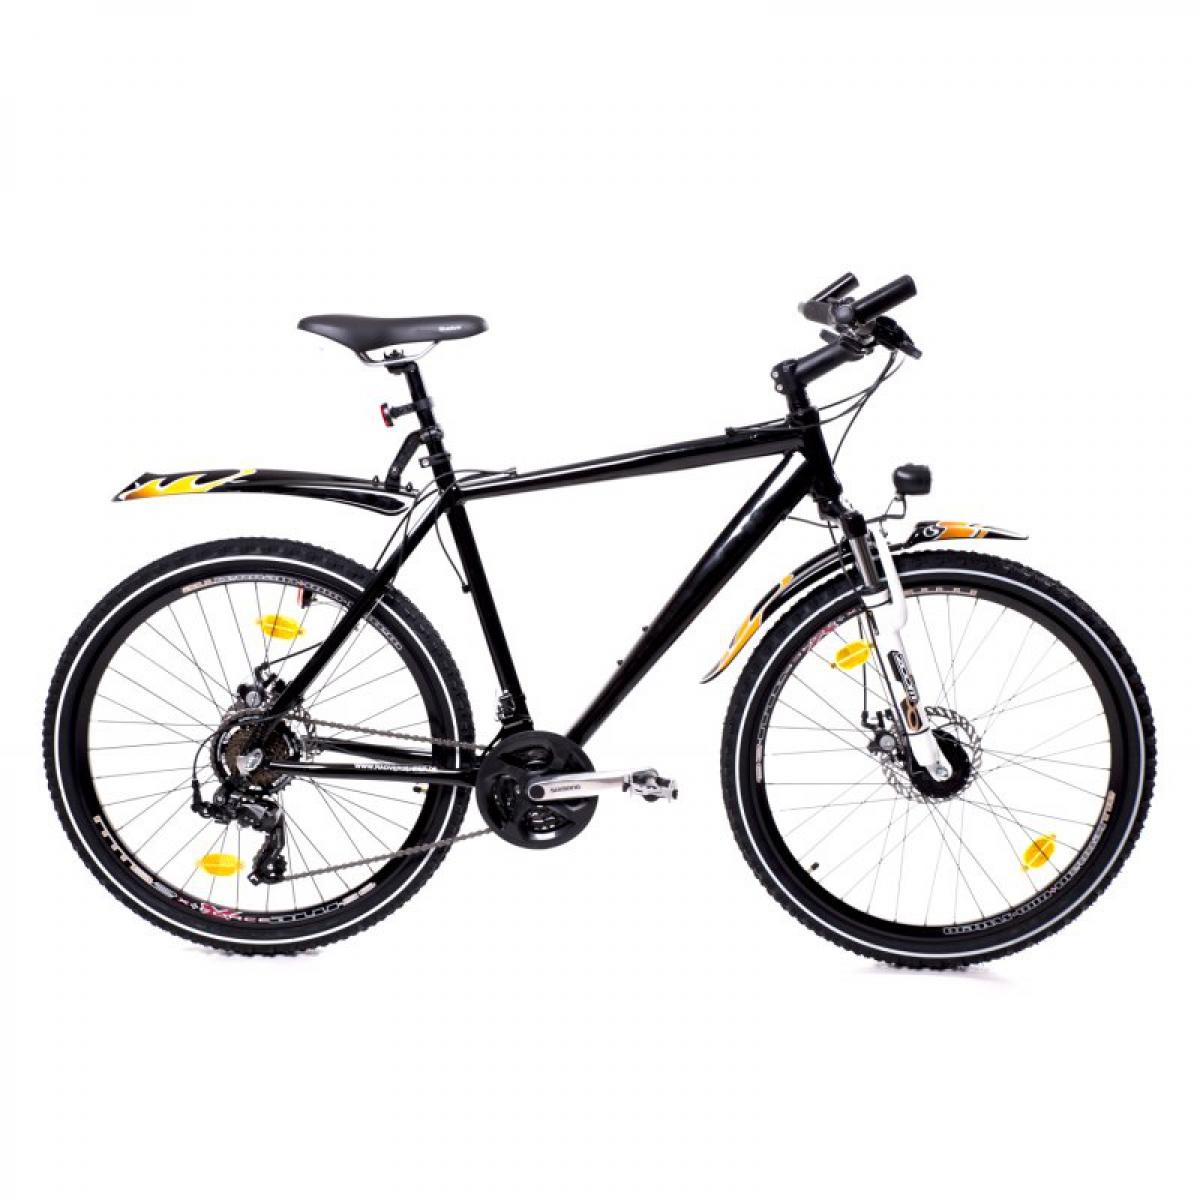 26 Zoll Mtb Cross Fahrrad Bike Shimano 21 Gang Stvzo Disc